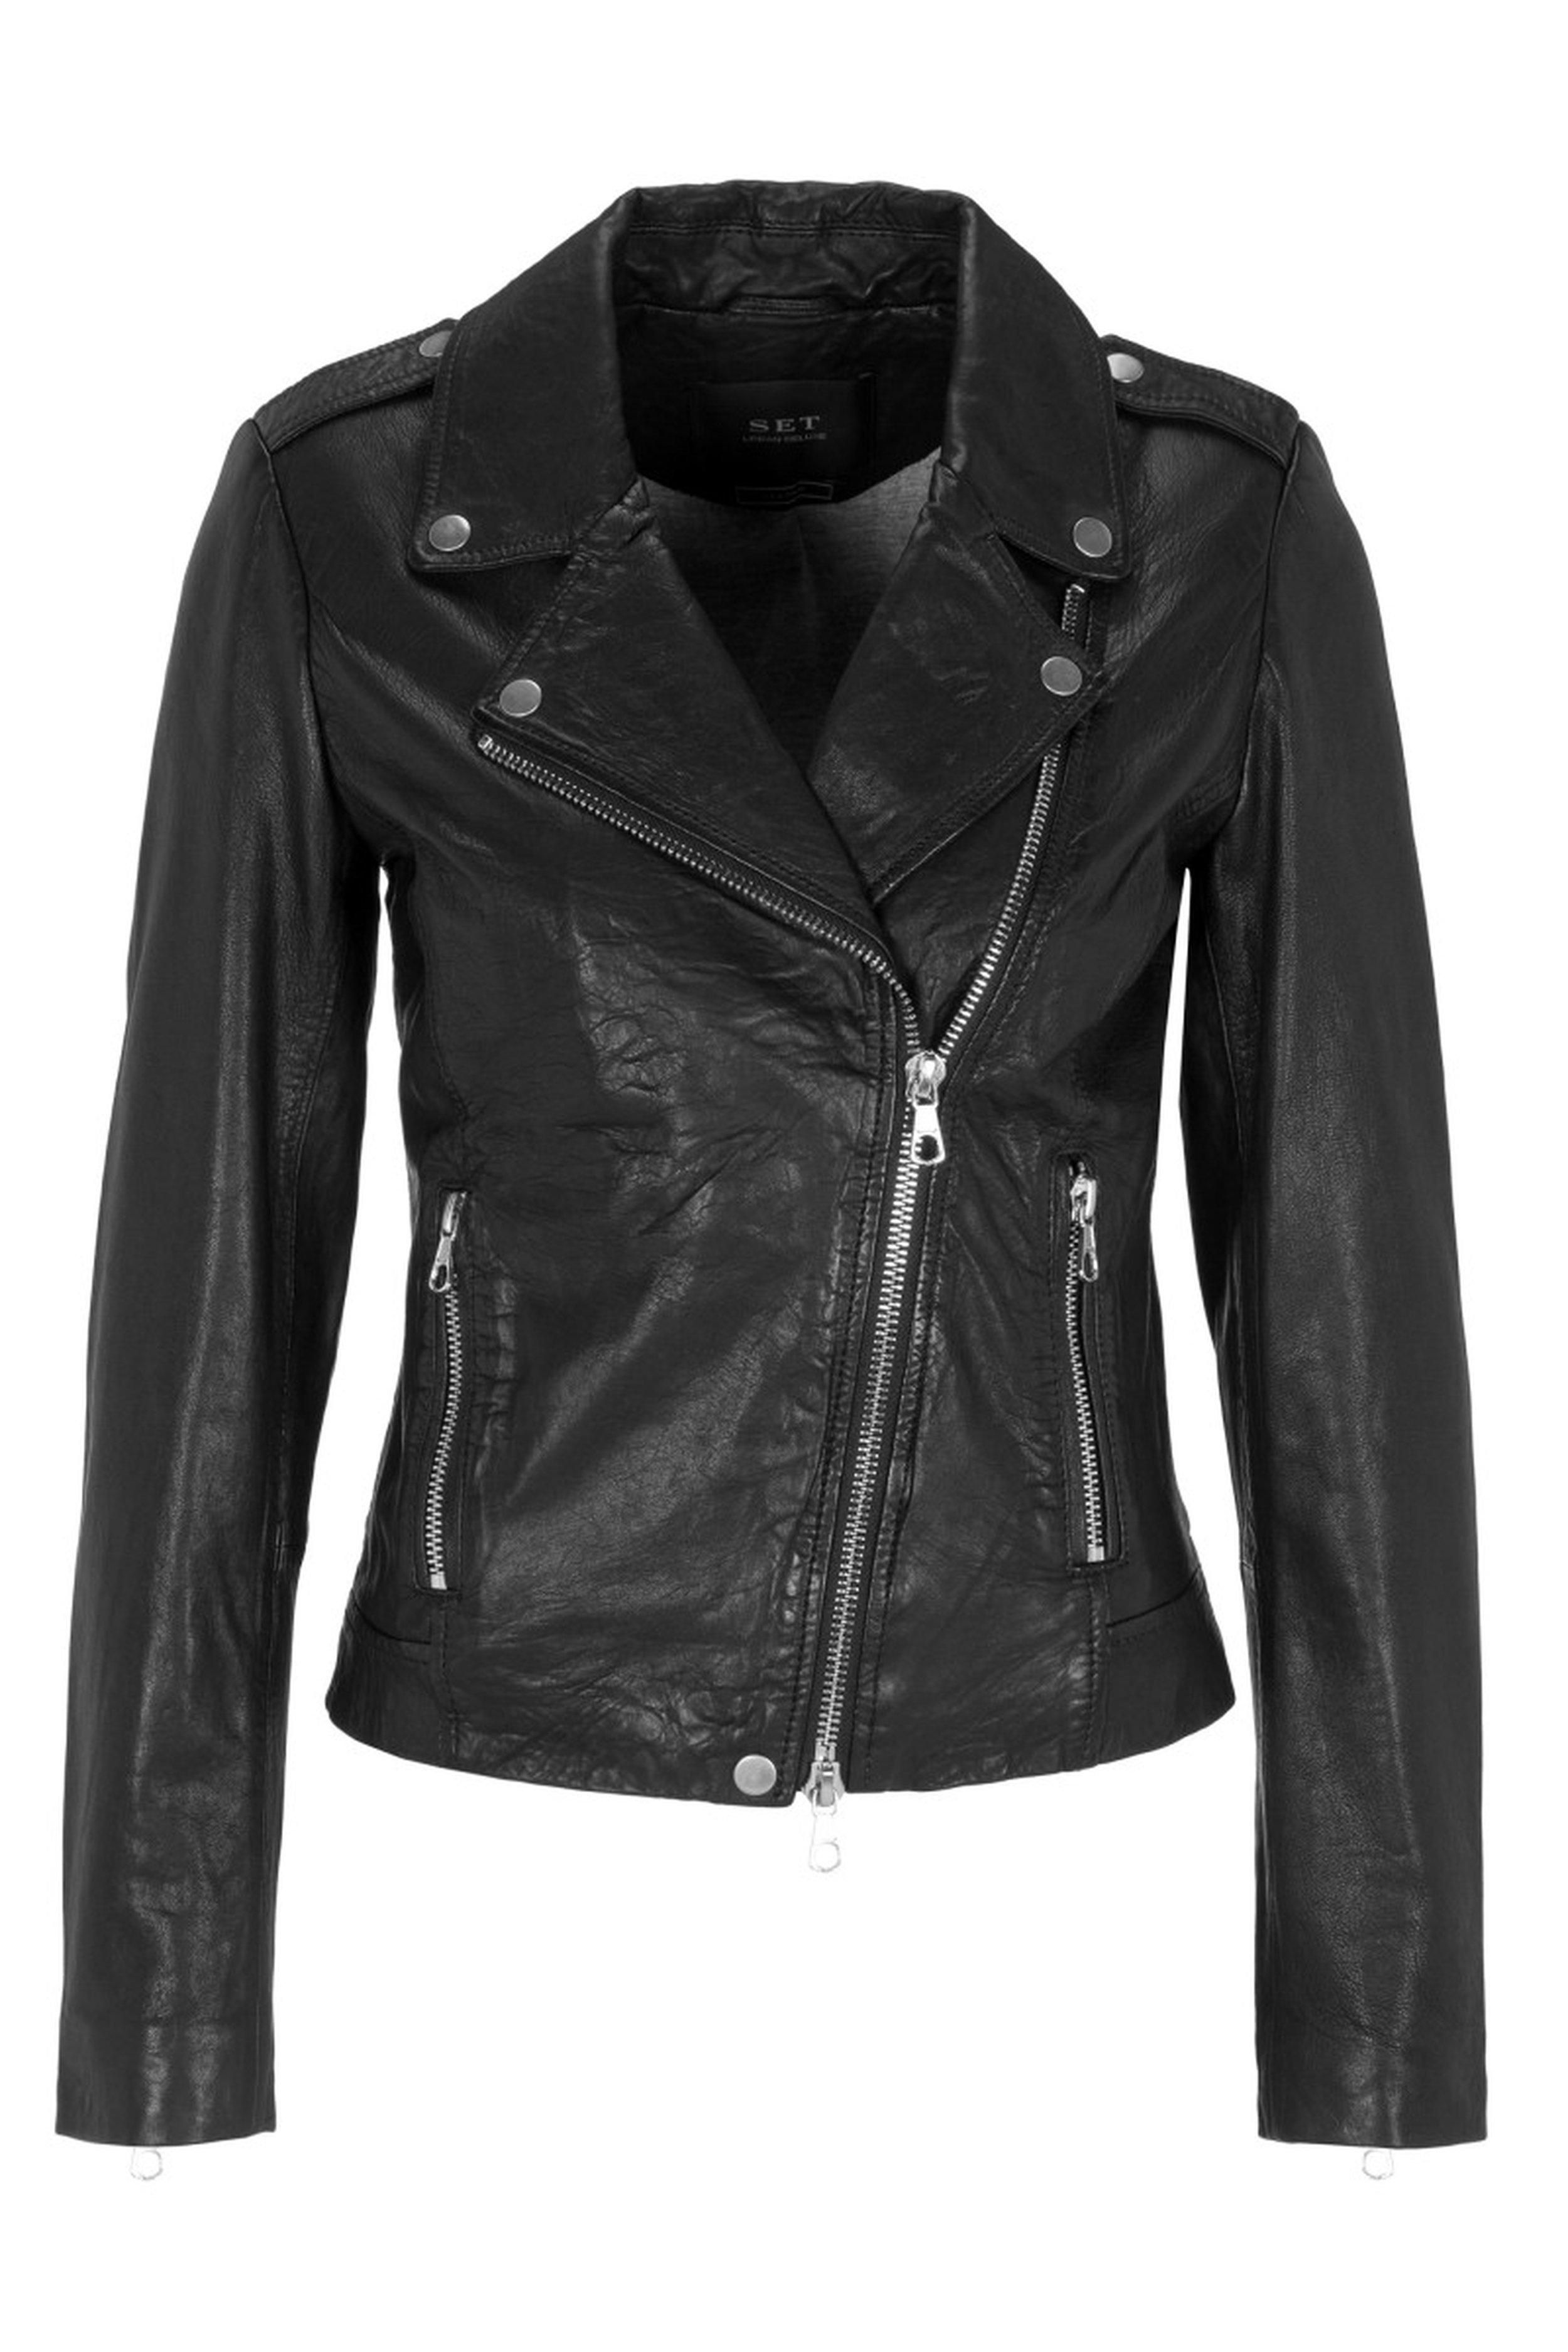 Set Fashion black.jpeg